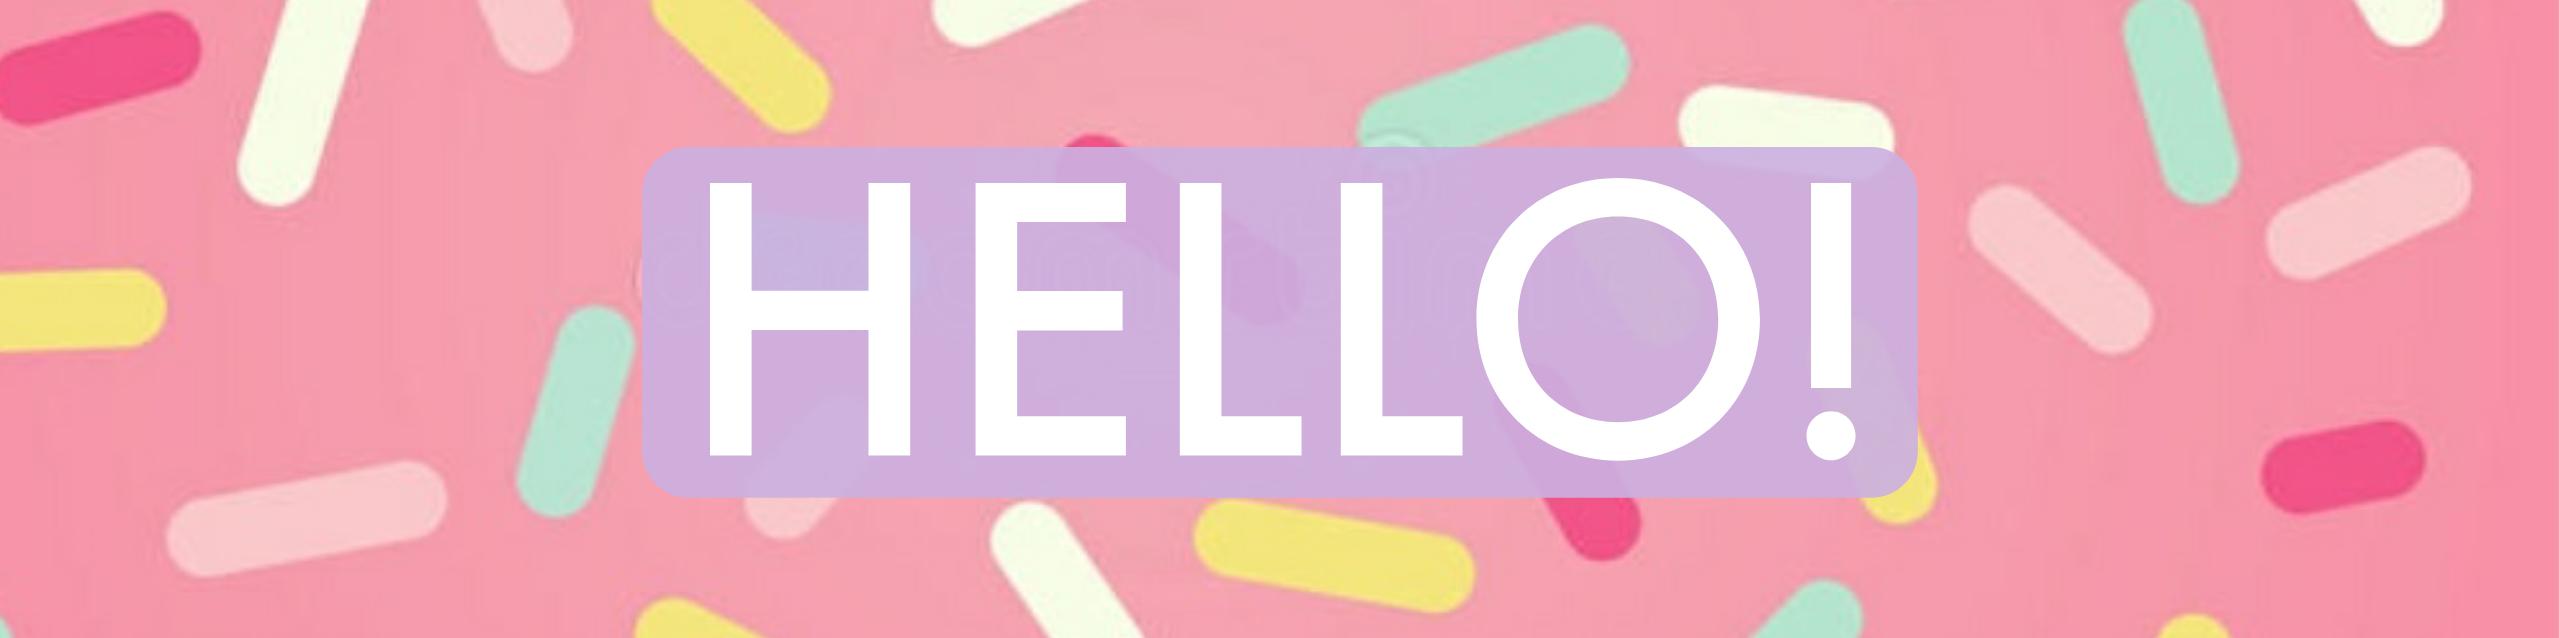 HELLOm.png